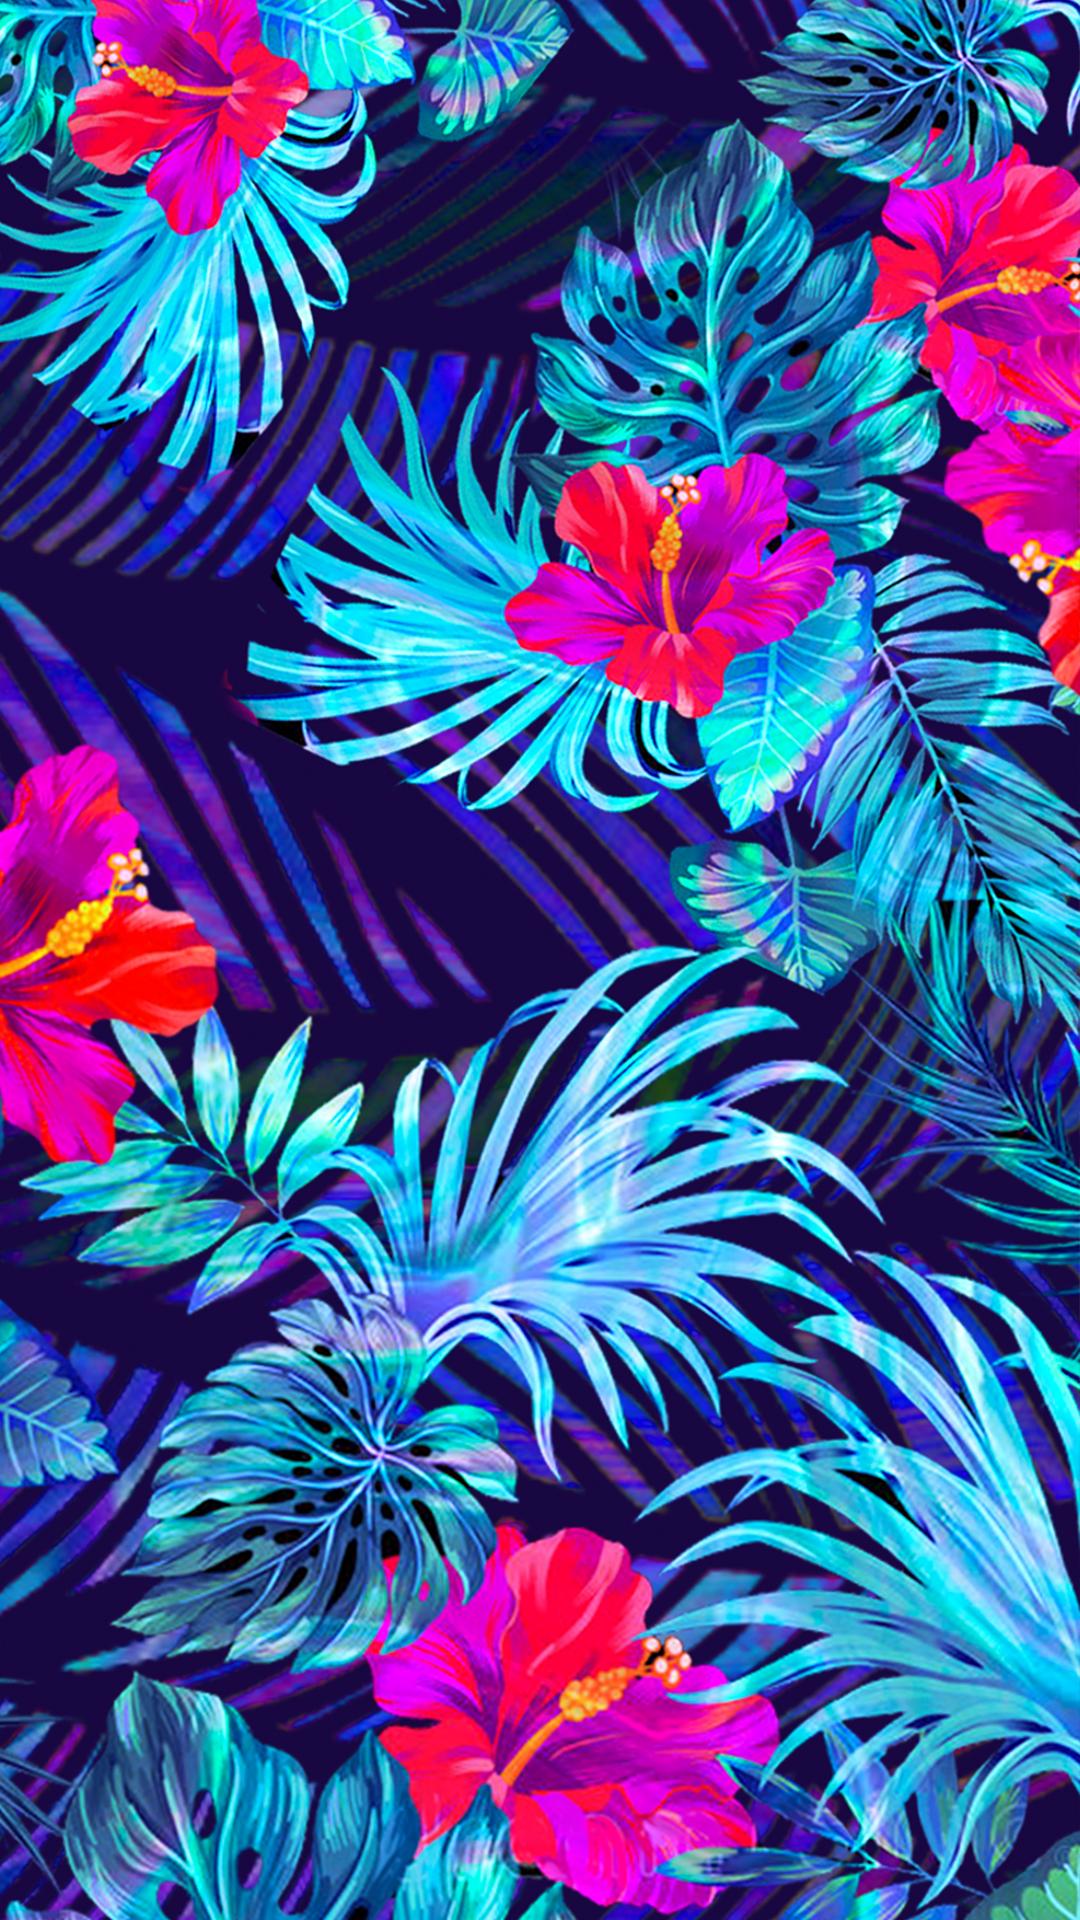 Capinha Para Celular Psicotropical Tumblr Wallpaper Papel